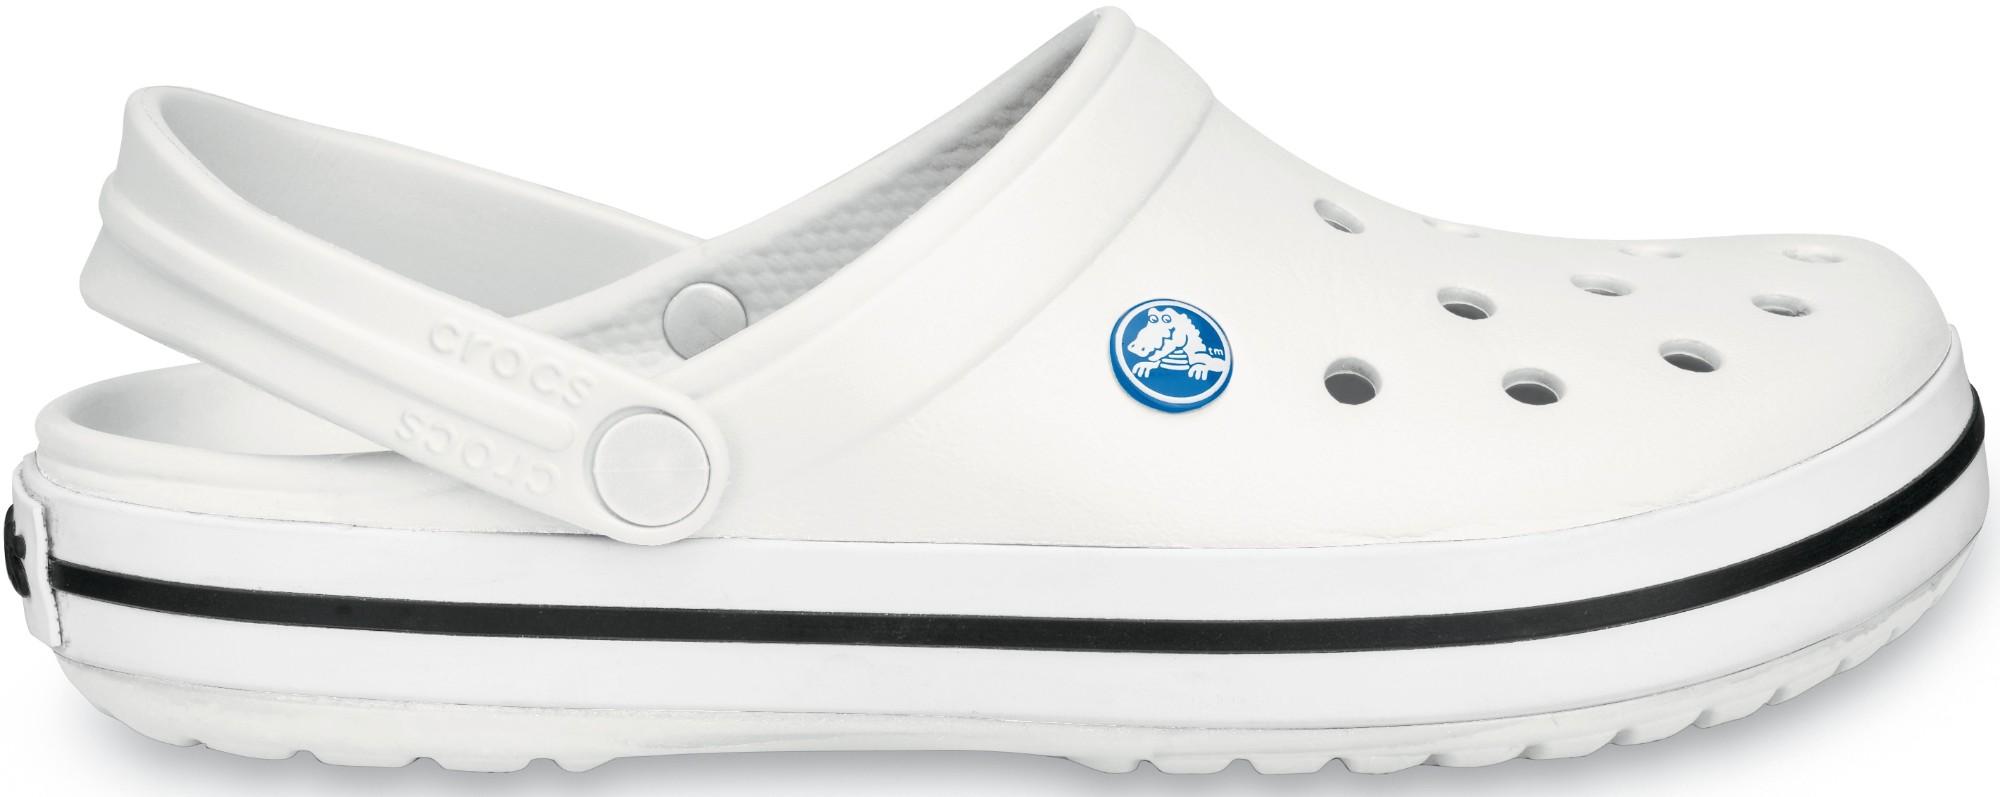 Crocs™ Crocband™ White 41